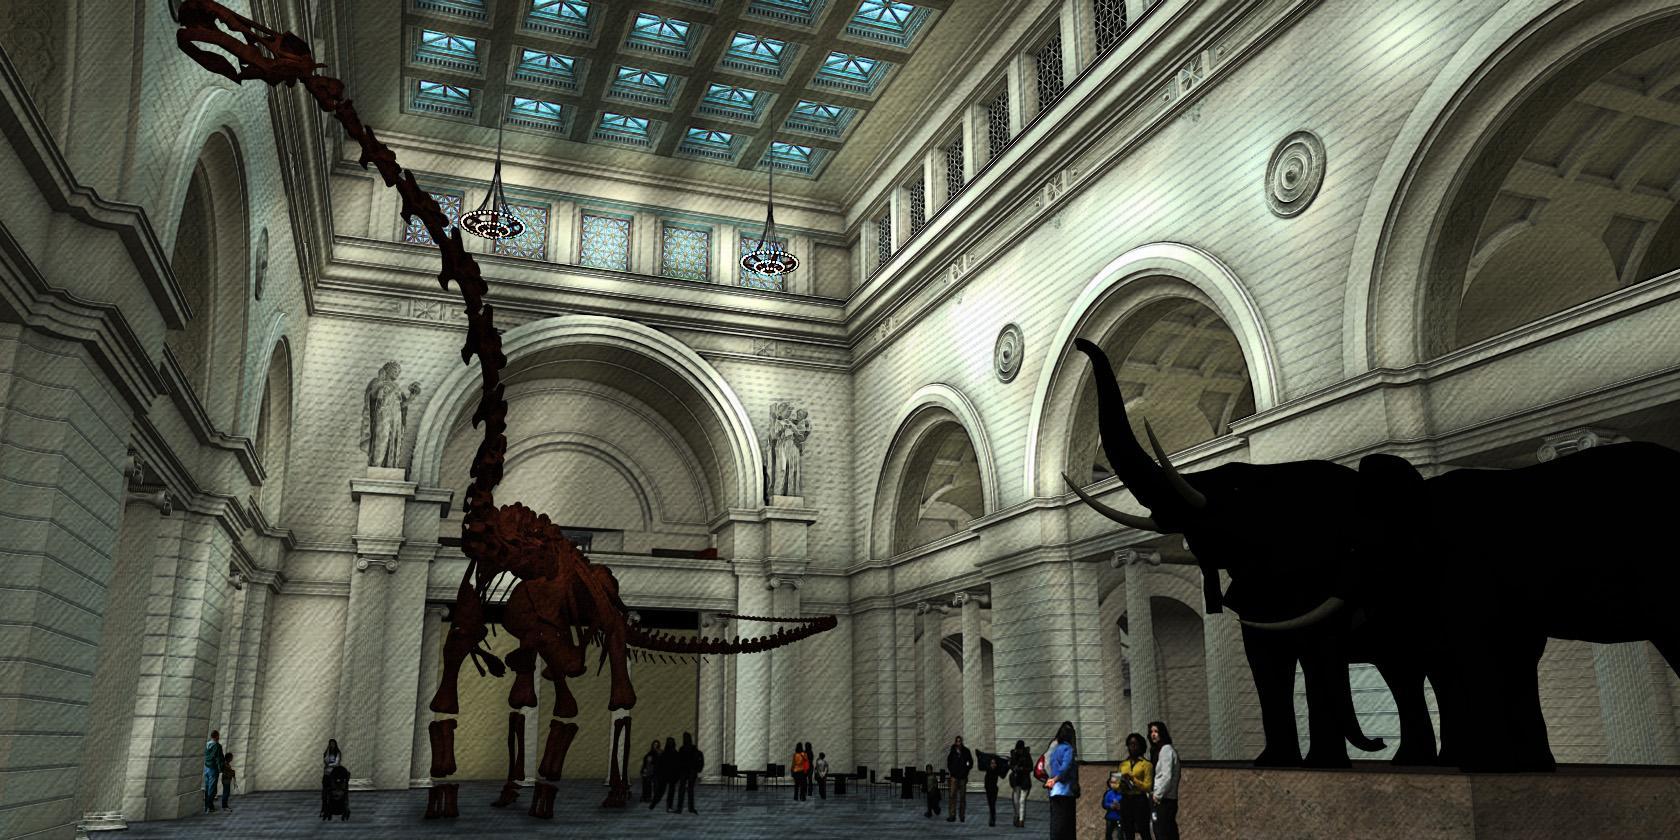 World Largest Dinosaur Coming Field Museum